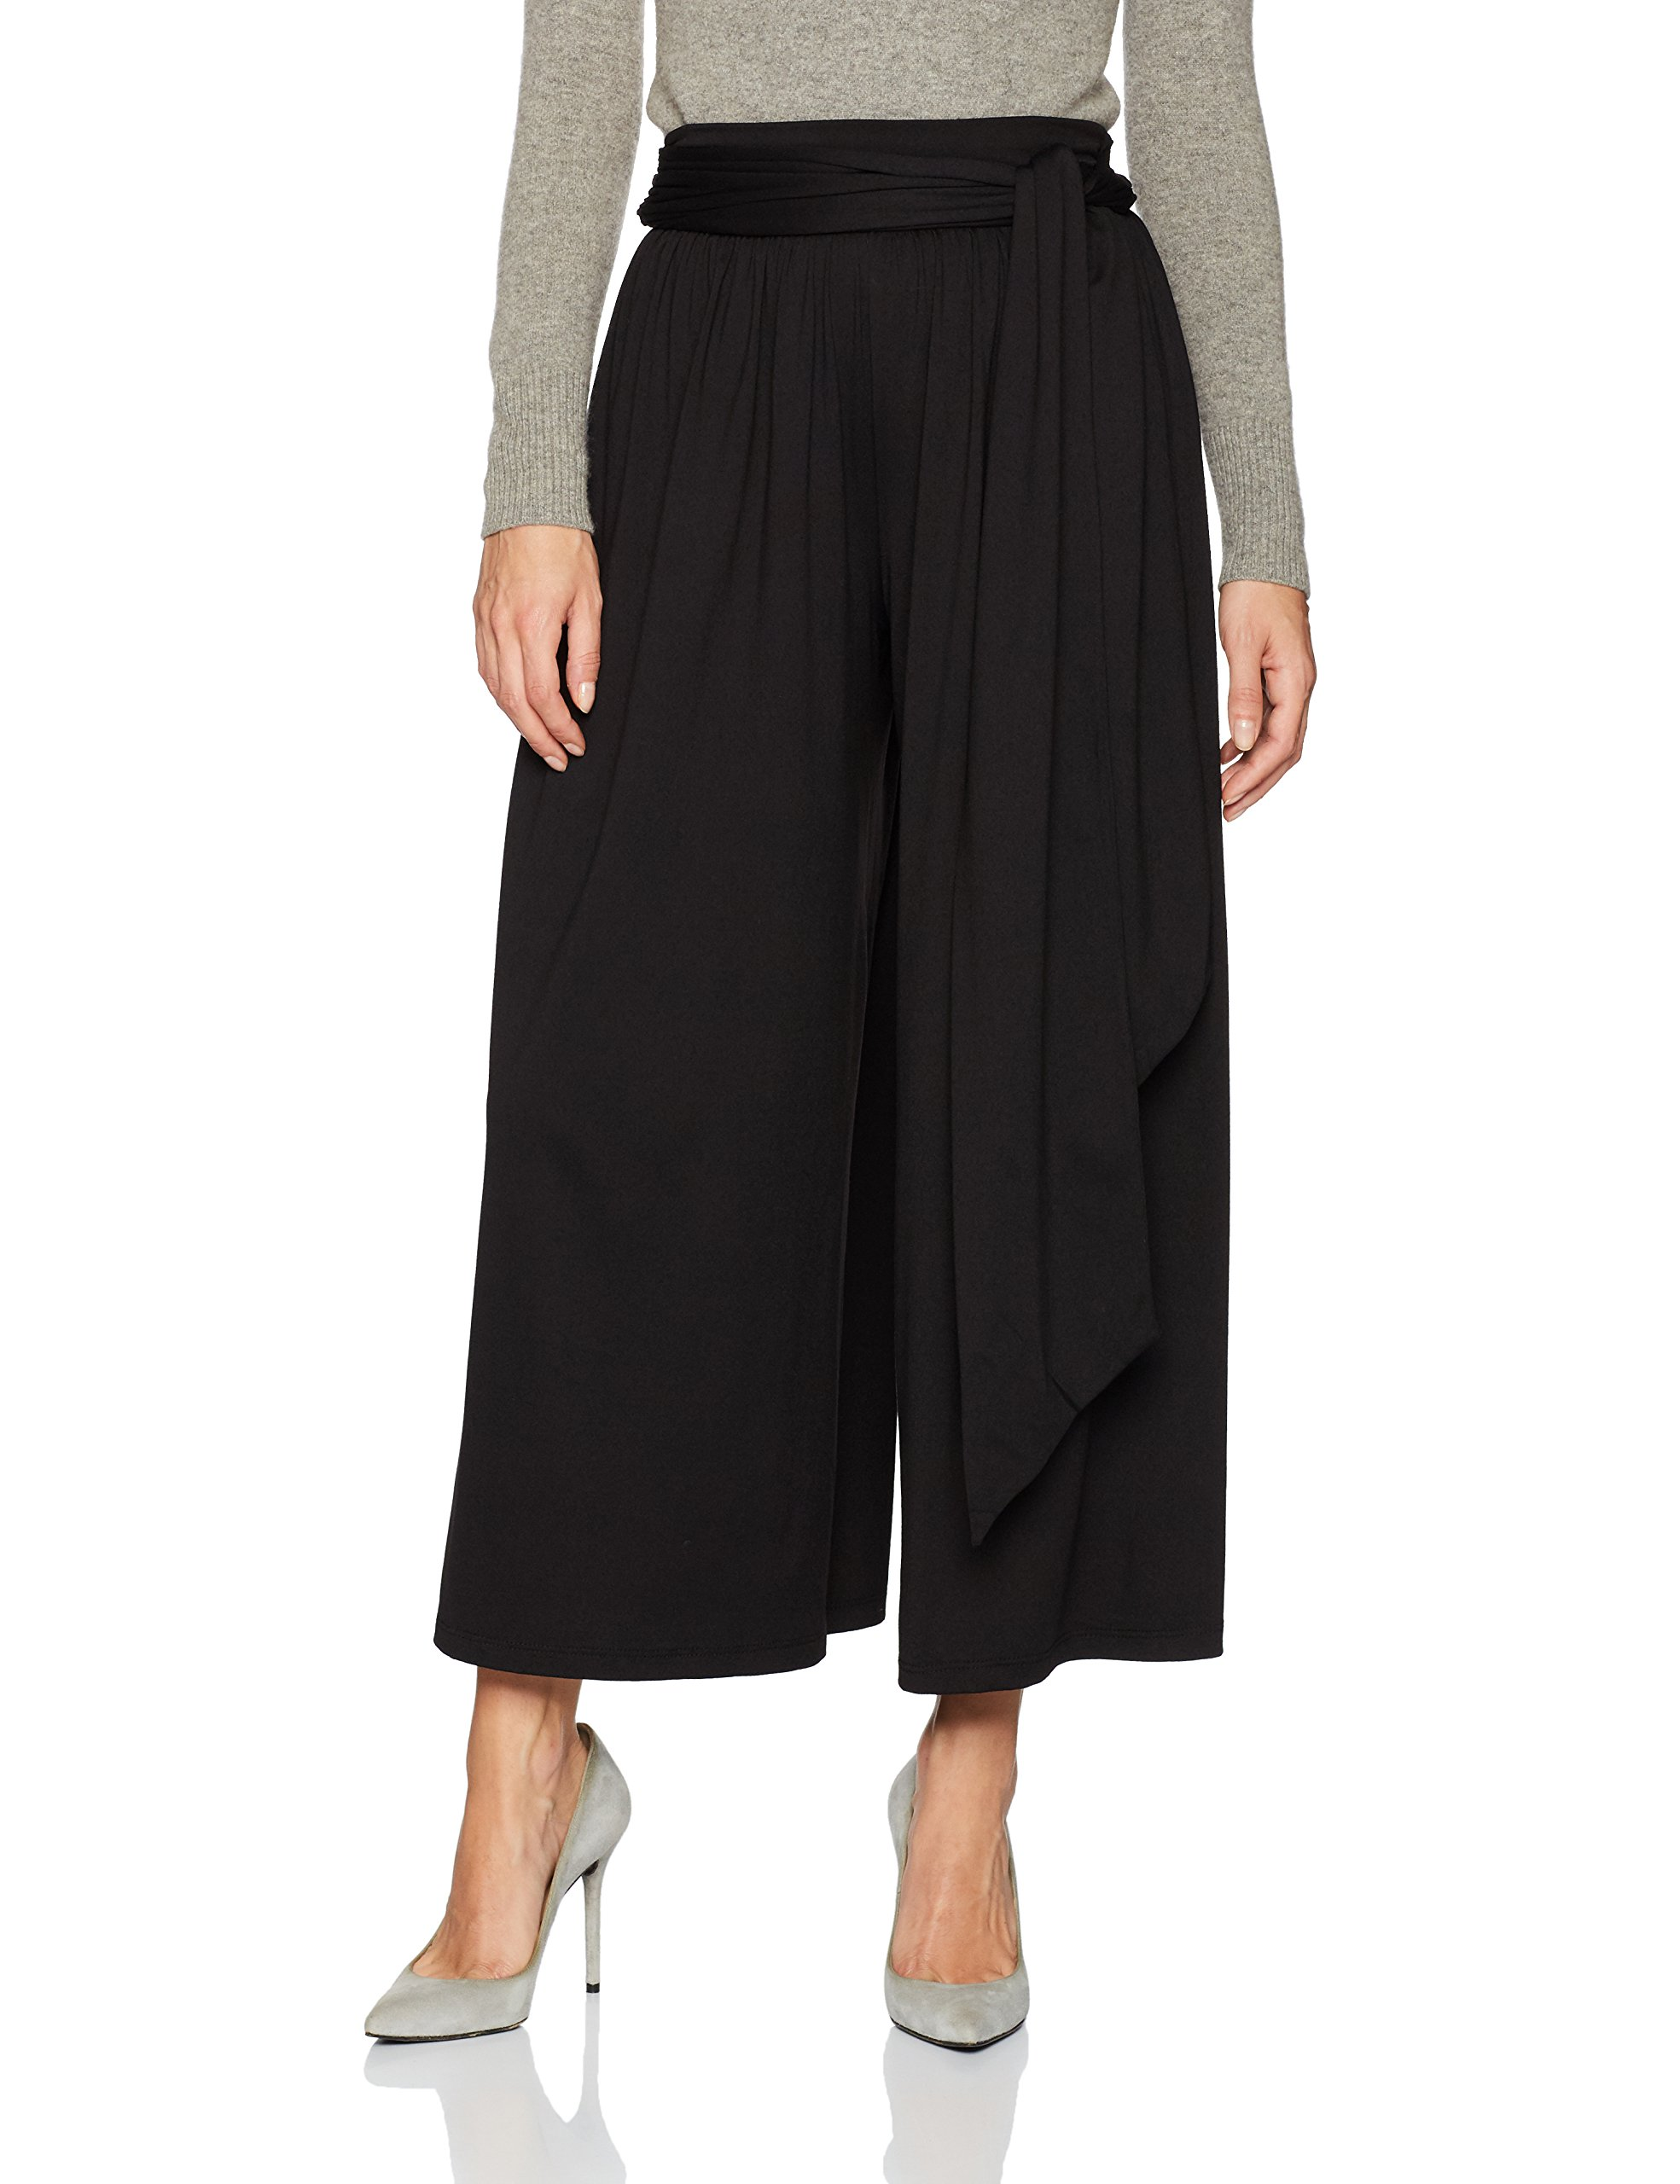 Susana Monaco Women's Leora Pant, Black, XL by Susana Monaco